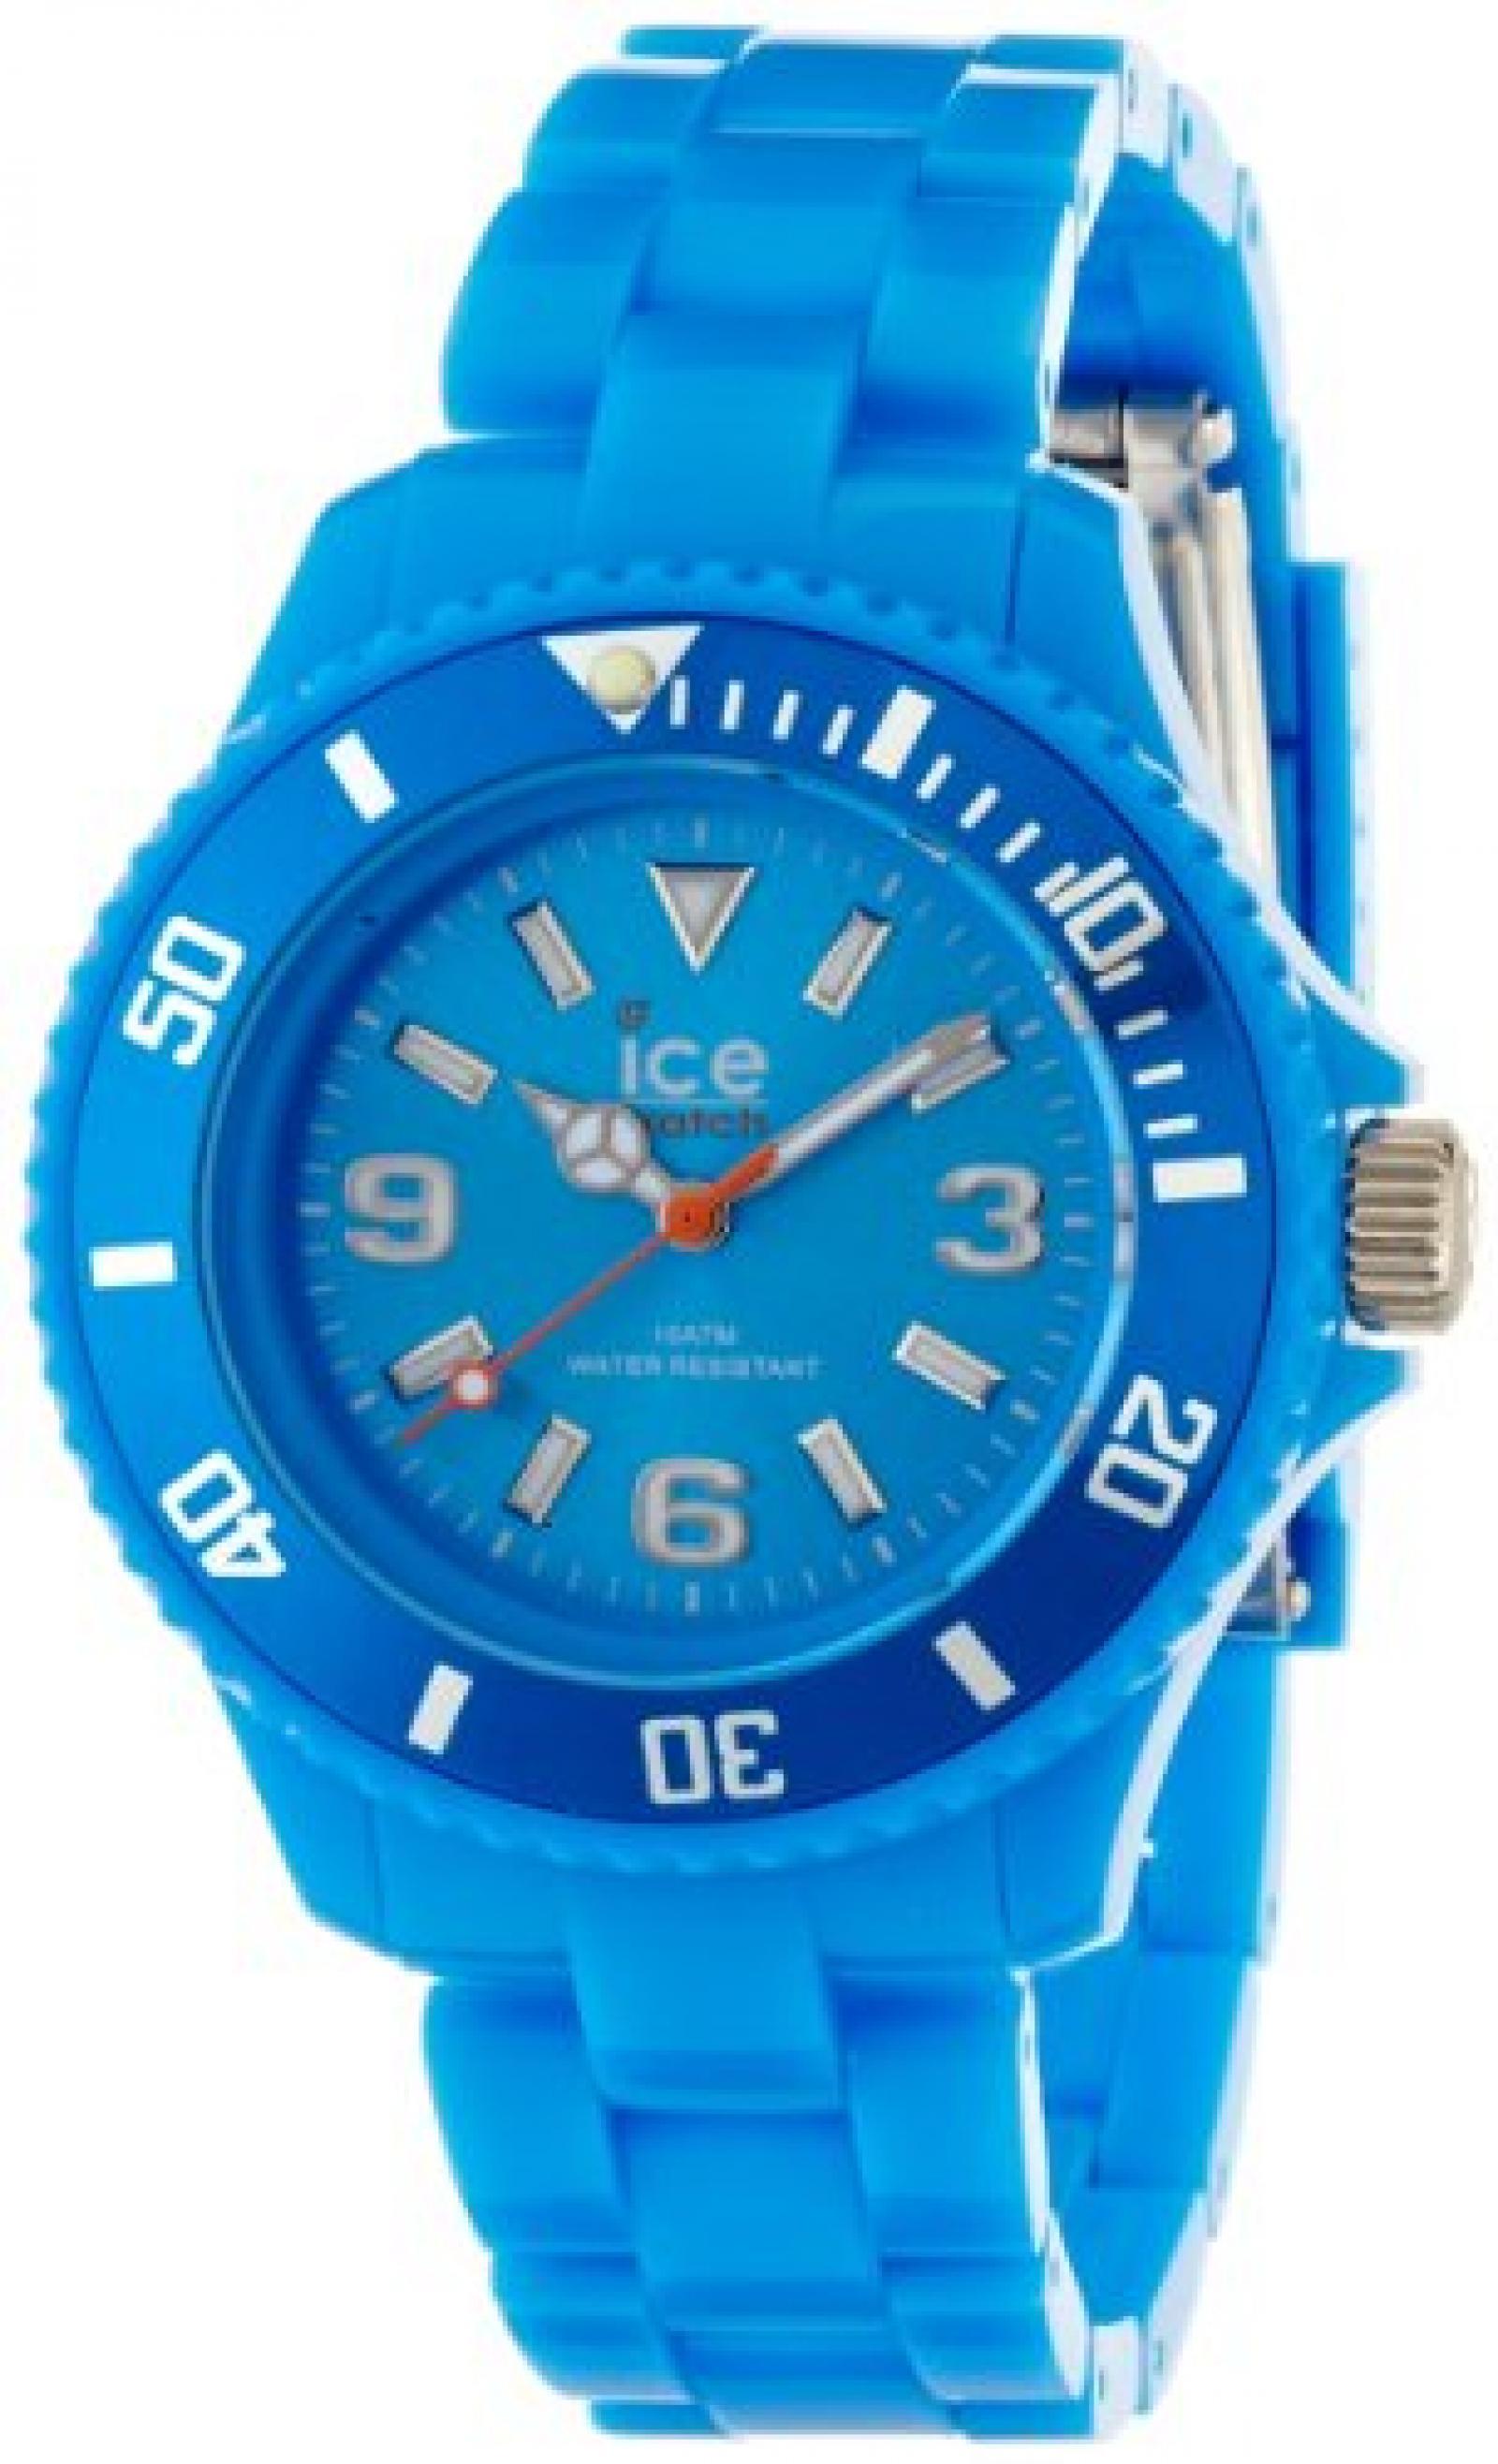 Ice-Watch Armbanduhr Ice-Solid blau SD.BE.S.P.12